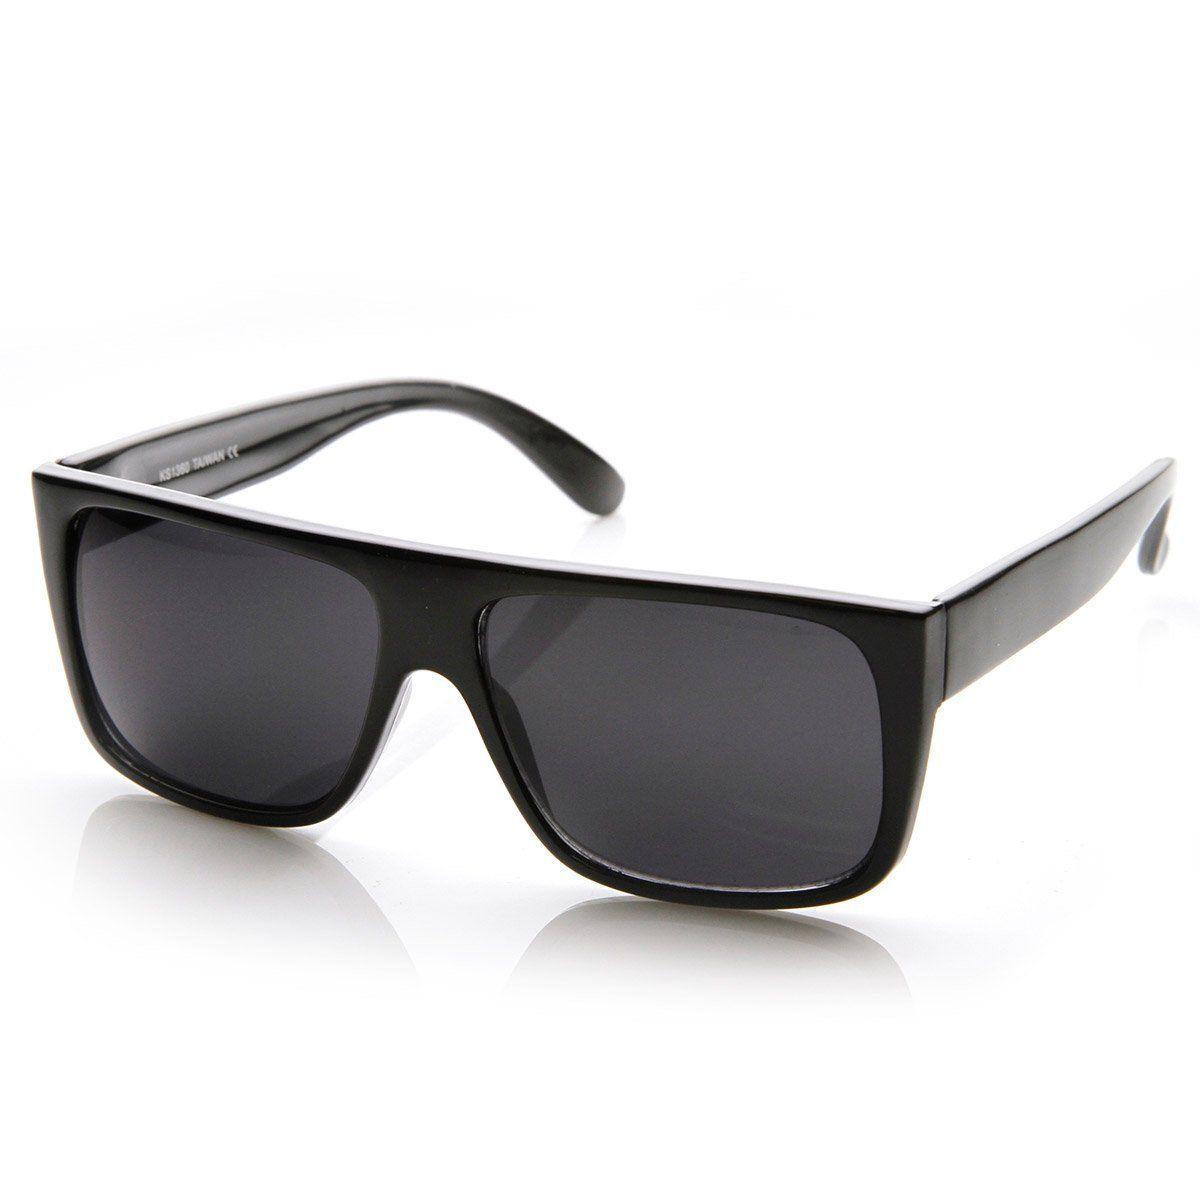 Gafas de sol hombre/unisex